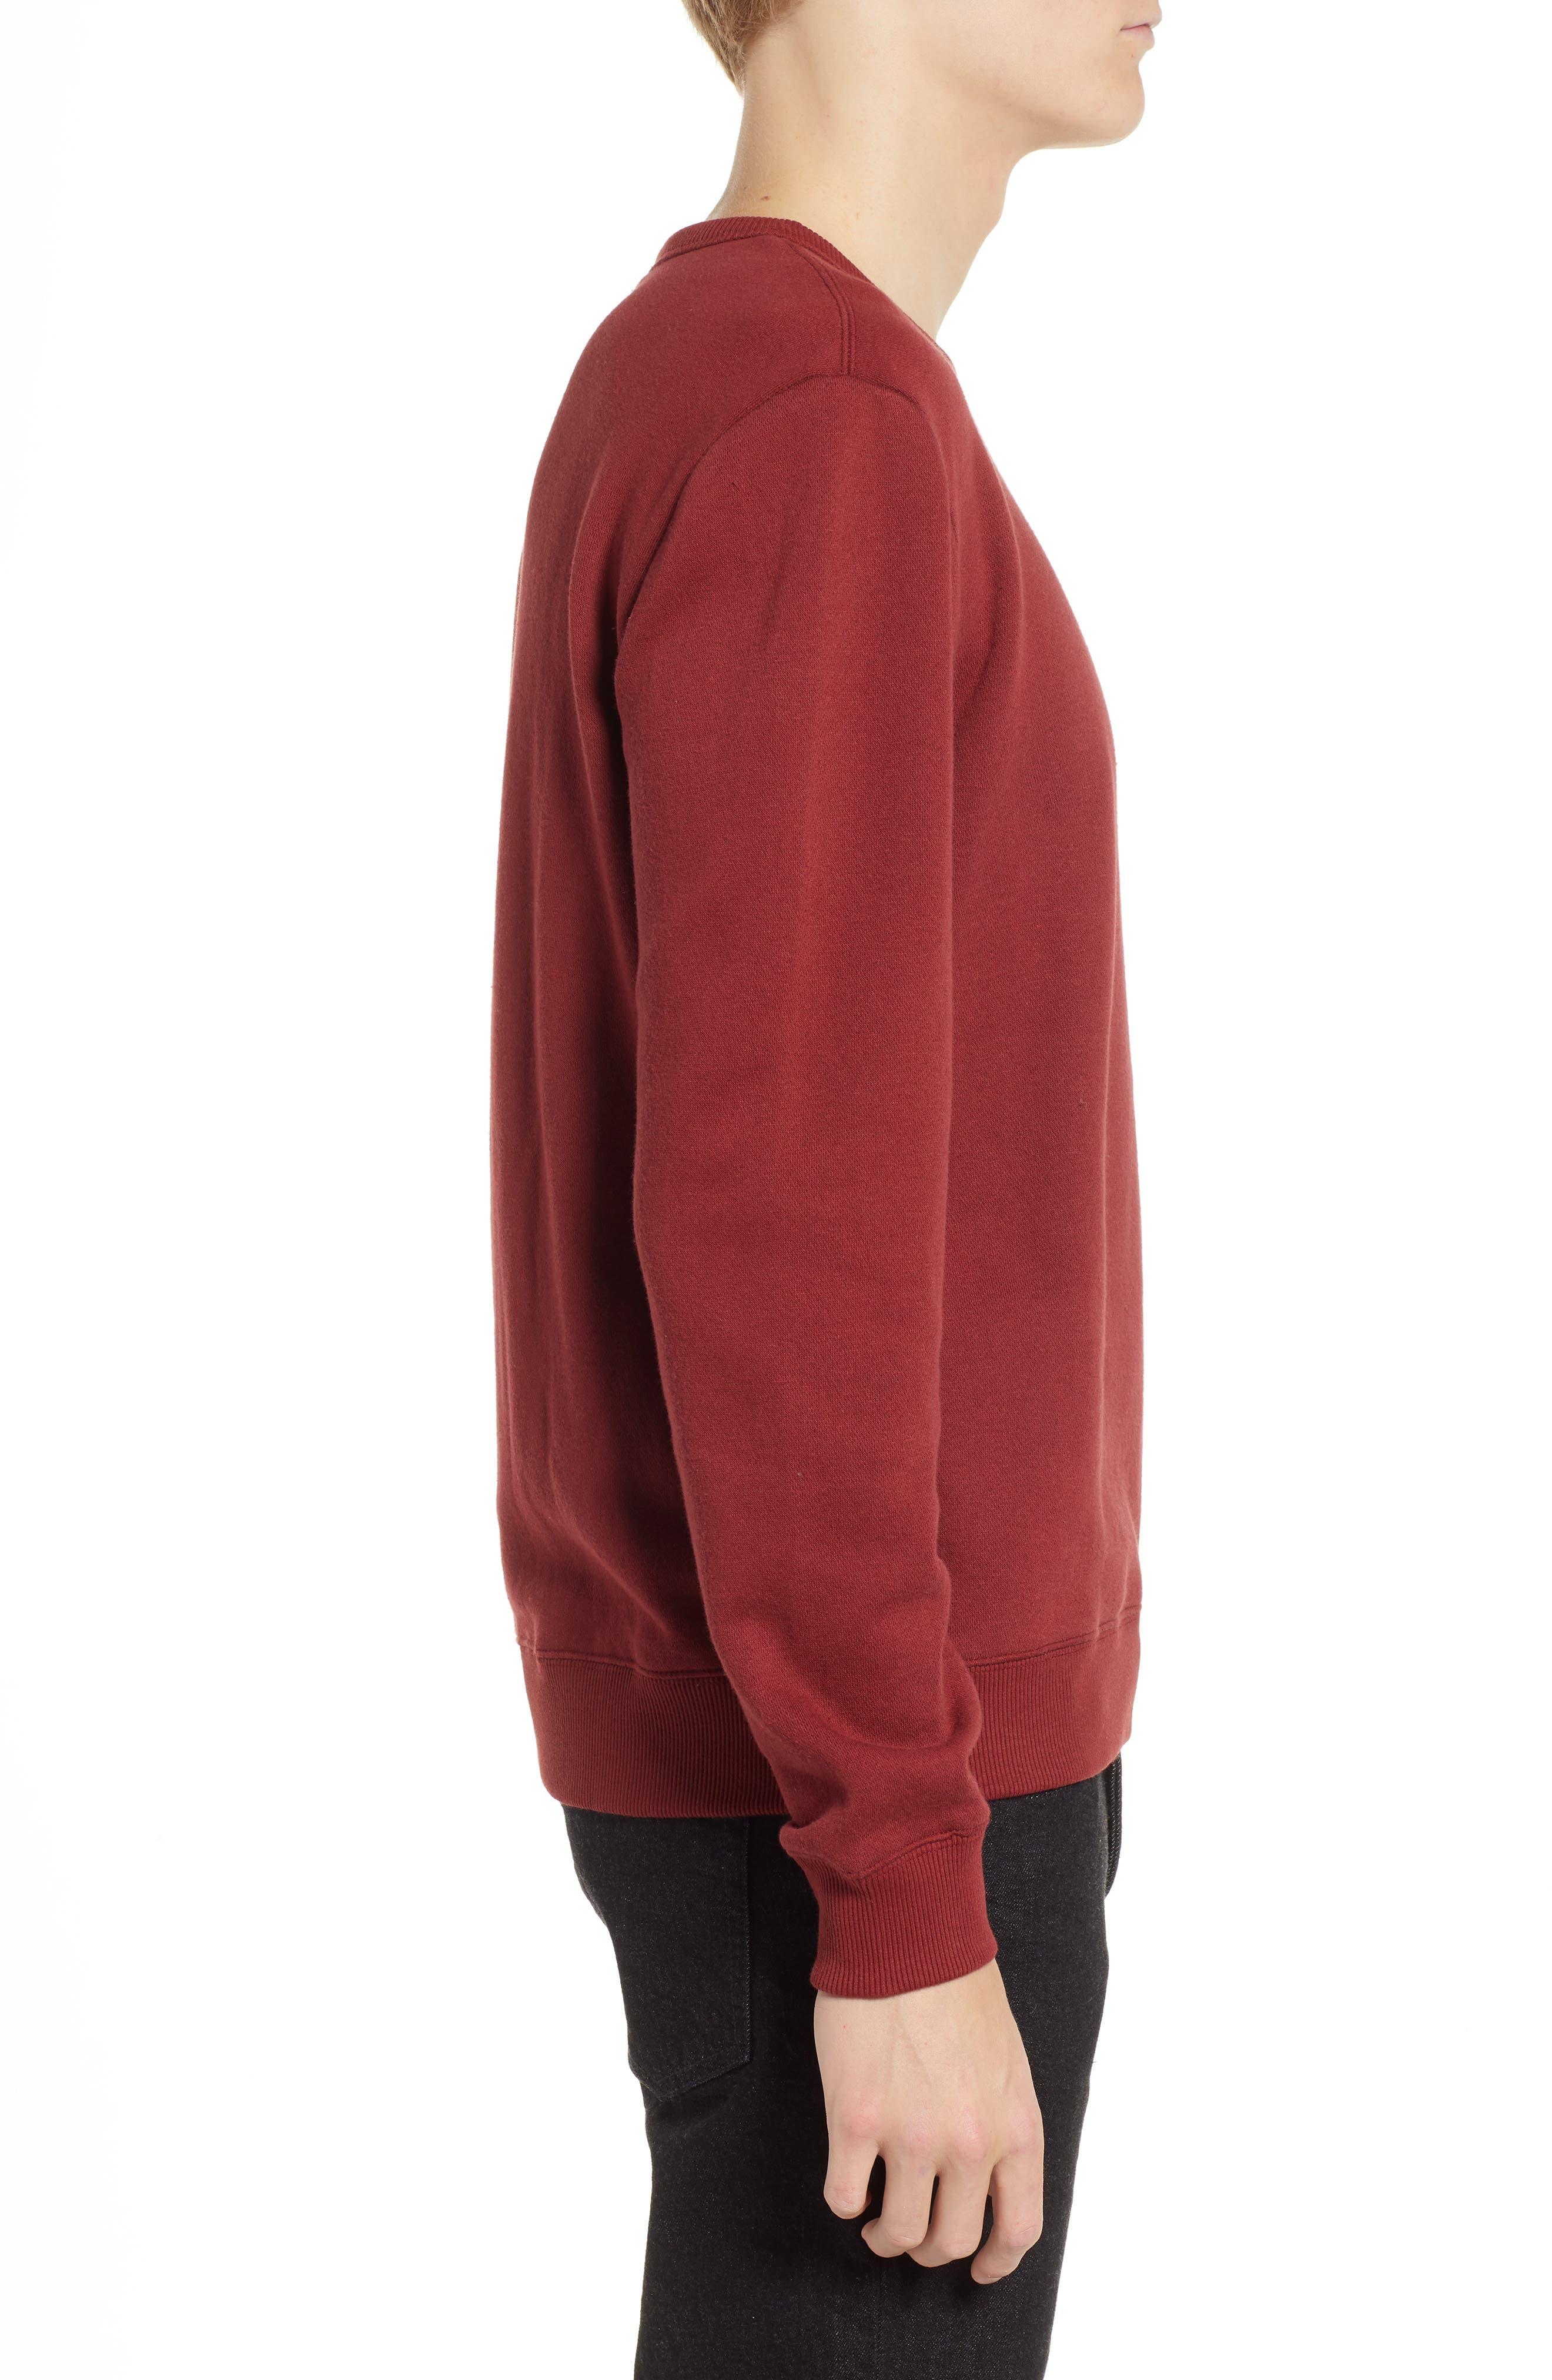 B-Shield Appliqué Crewneck Sweatshirt,                             Alternate thumbnail 3, color,                             RED